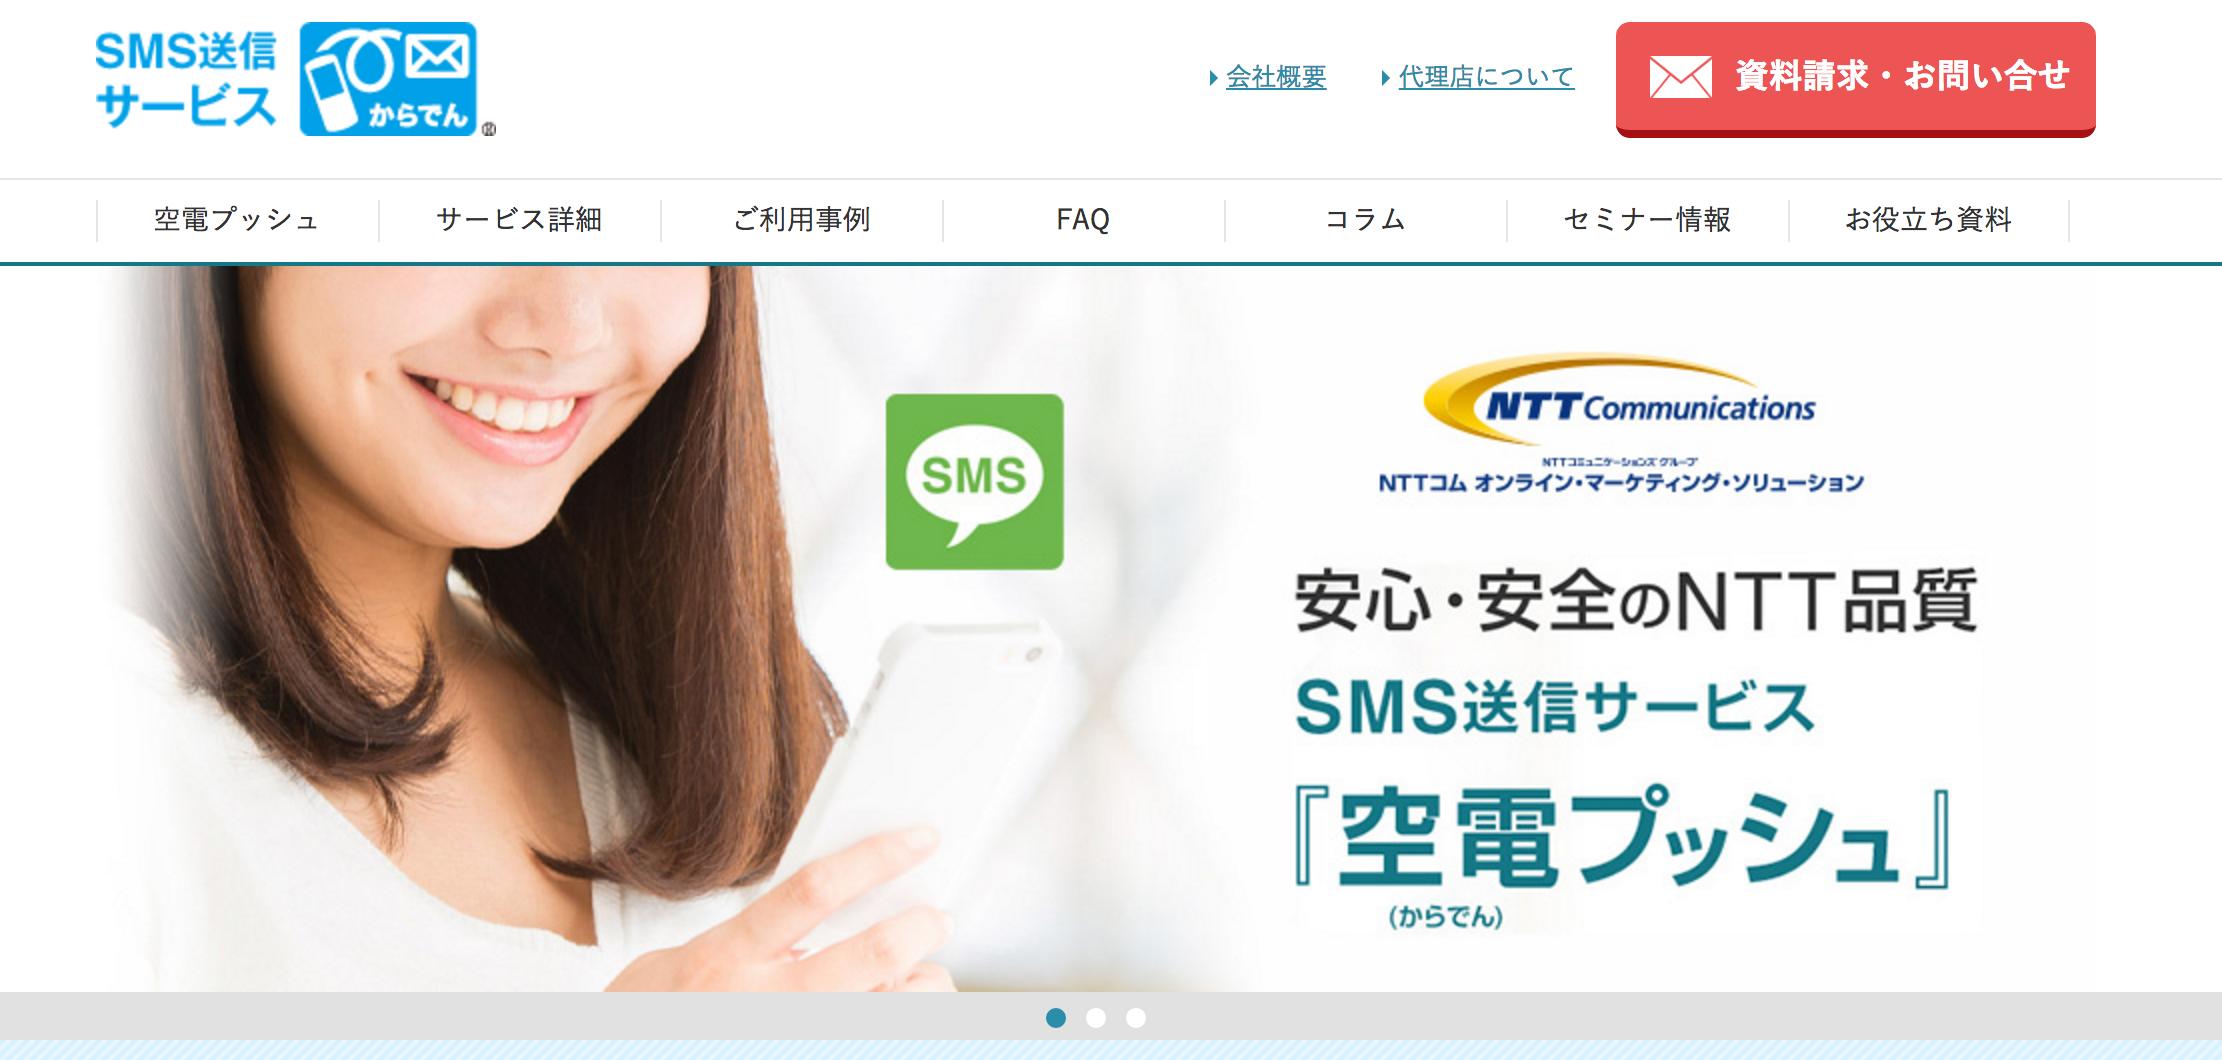 SMS の配信 事業者 比較 一覧 NTTコムオンラインマーケティングソリューション 空電プッシュ